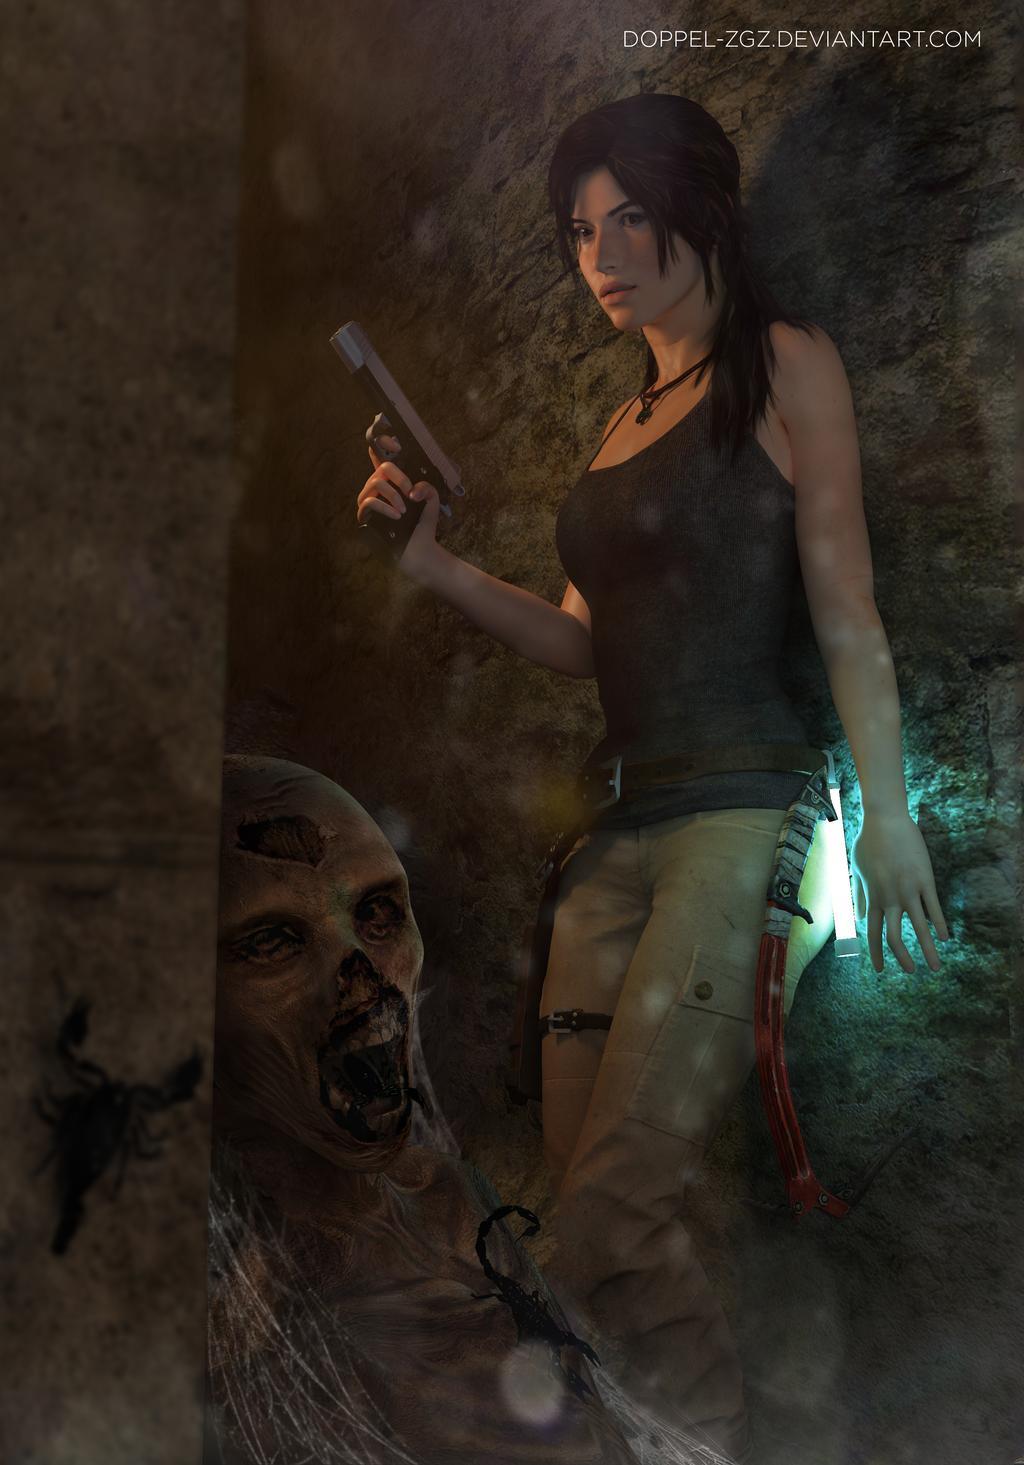 entering_prophet_s_tomb_by_doppel_zgz_da3mc0d-fullview.jpg - Rise of the Tomb Raider